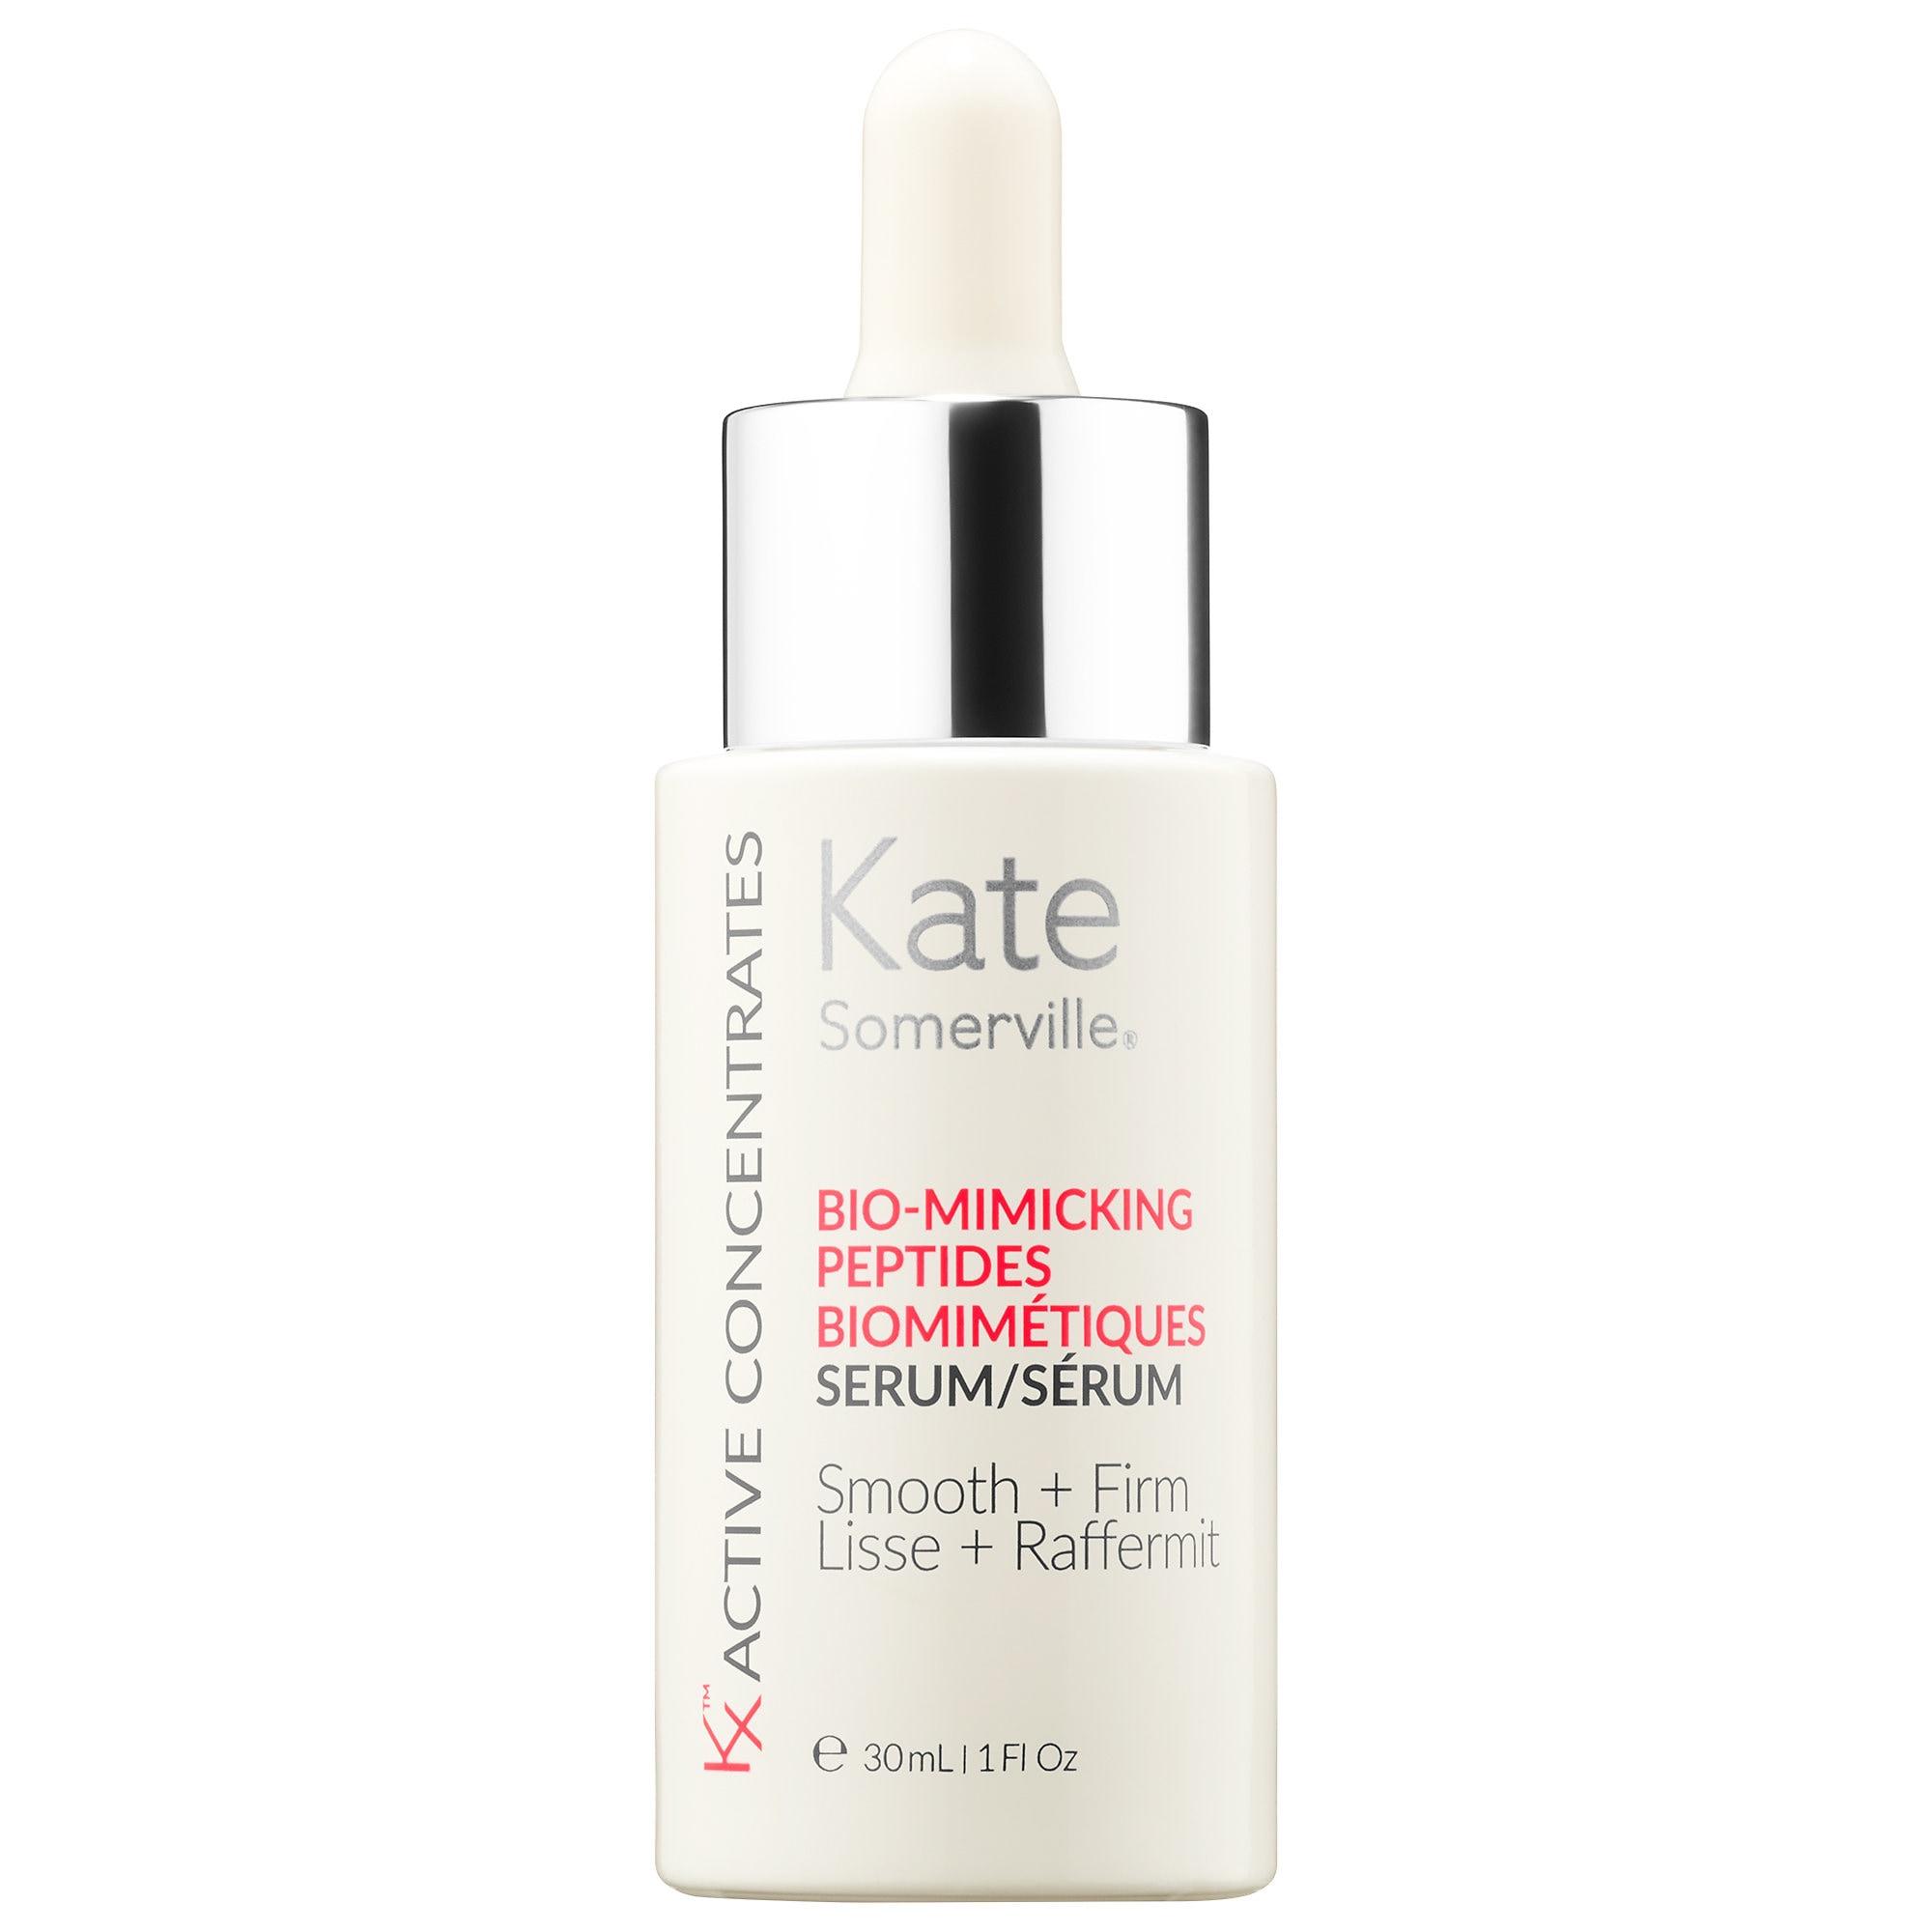 Kate Somerville Skincare - Kx Active Concentrates Bio-Mimicking Peptides Serum